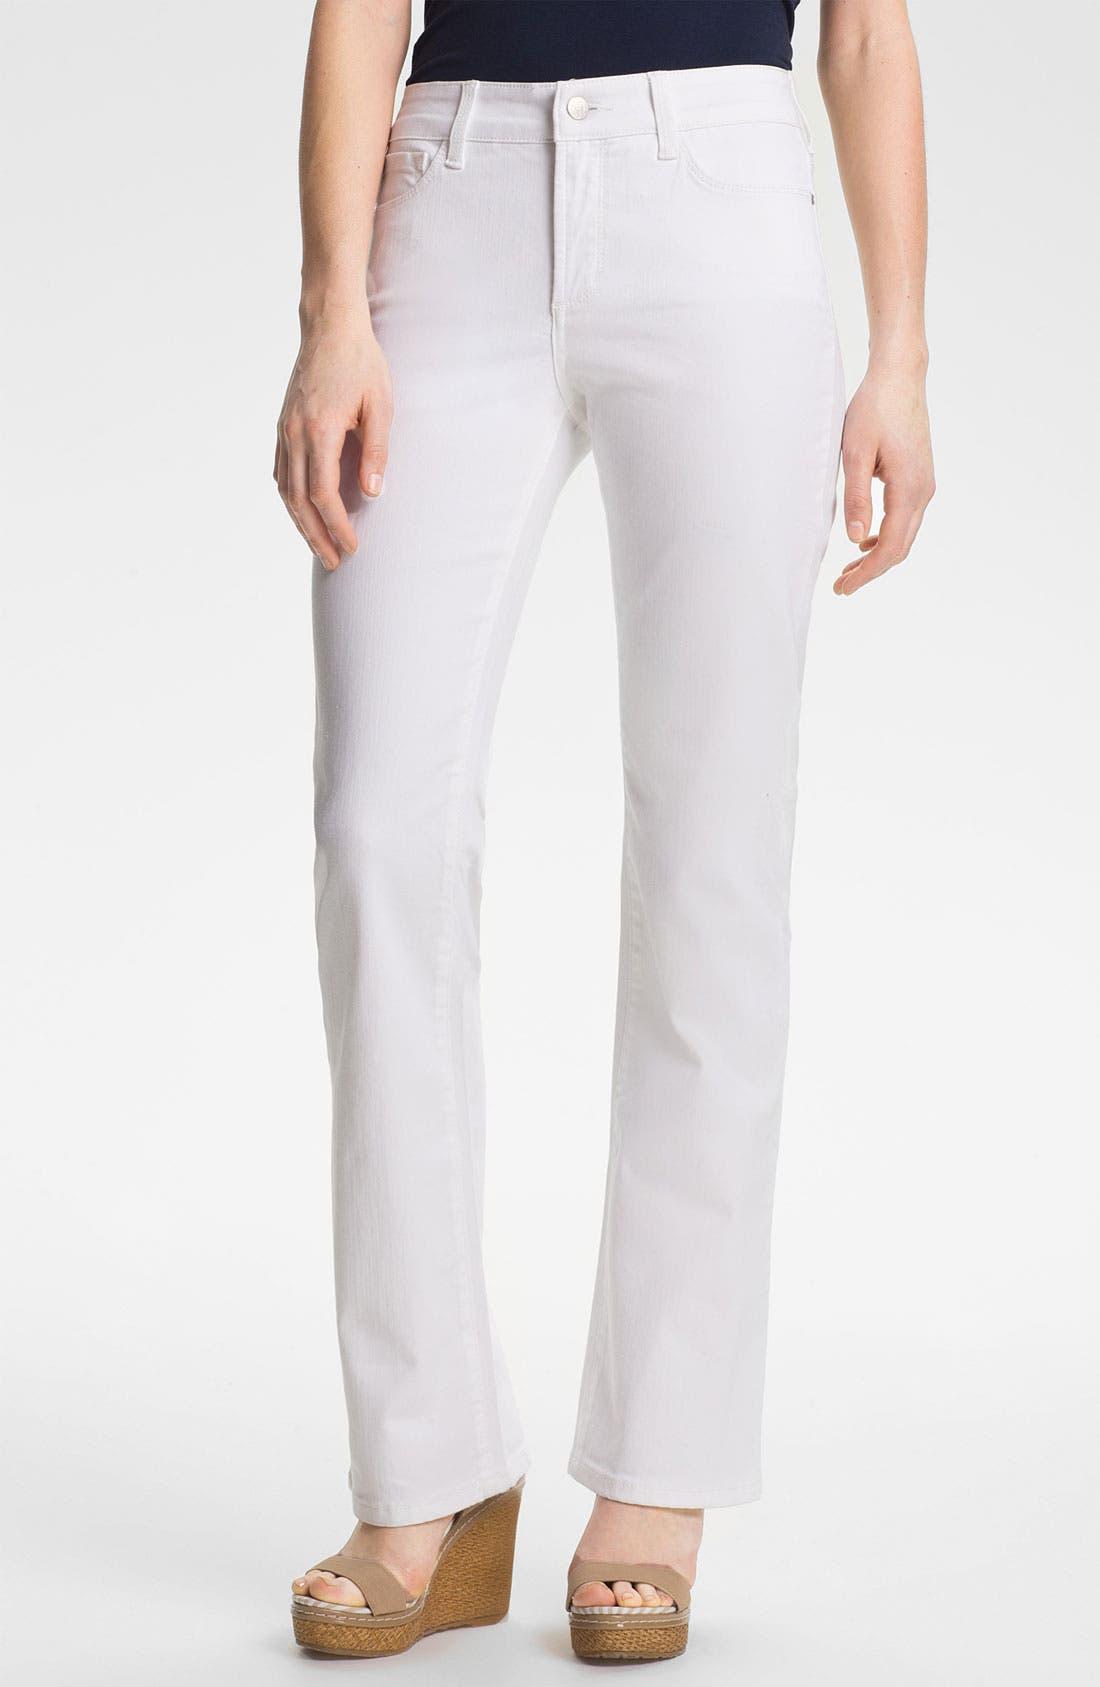 Alternate Image 1 Selected - NYDJ 'Barbara' Bootcut Jeans